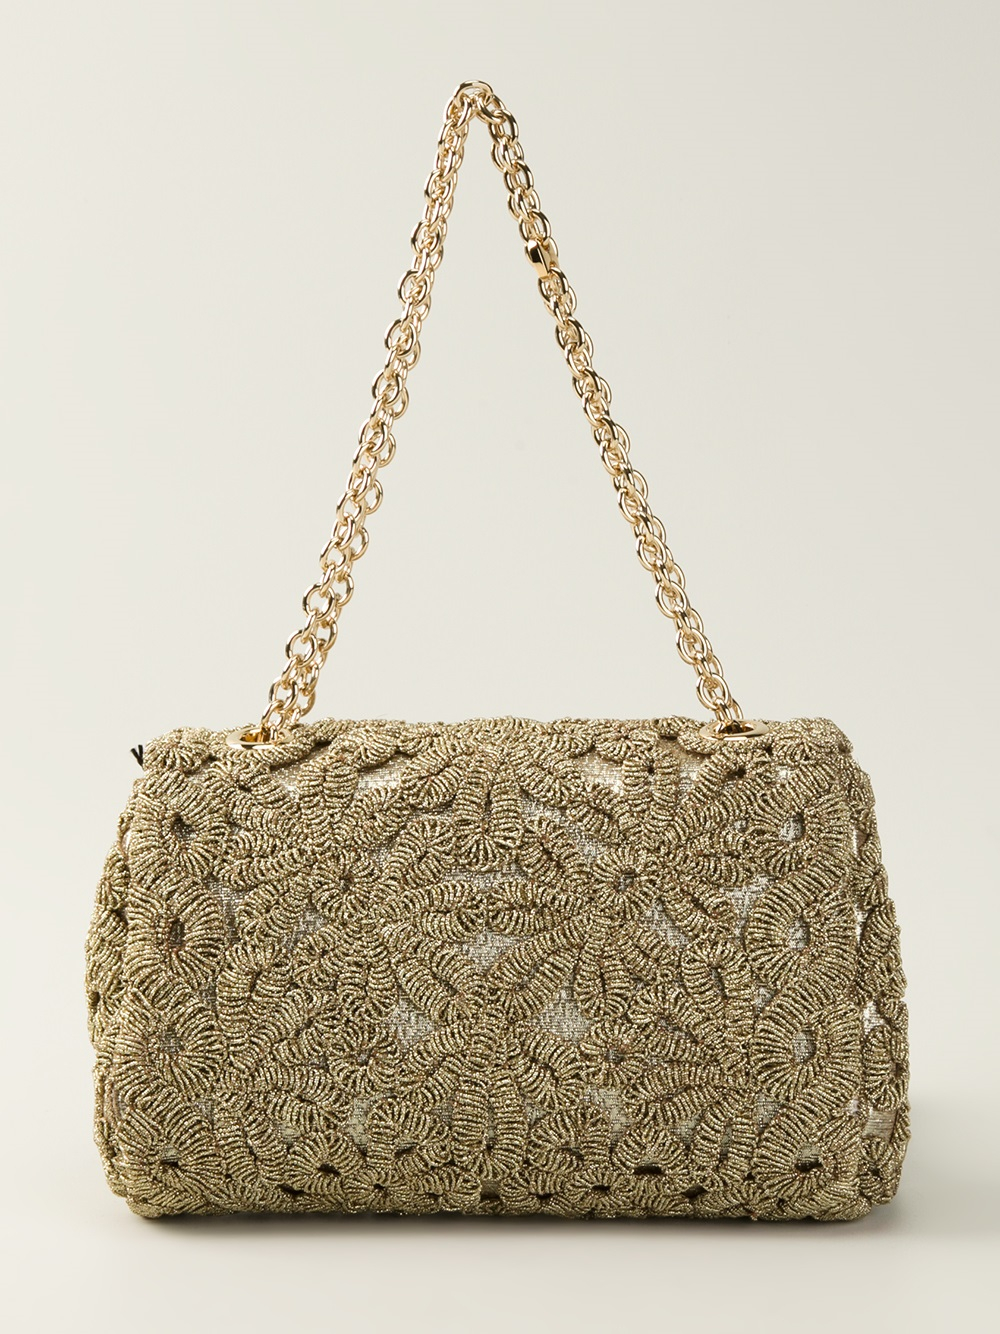 dolce gabbana crochet padlock shoulder bag in metallic